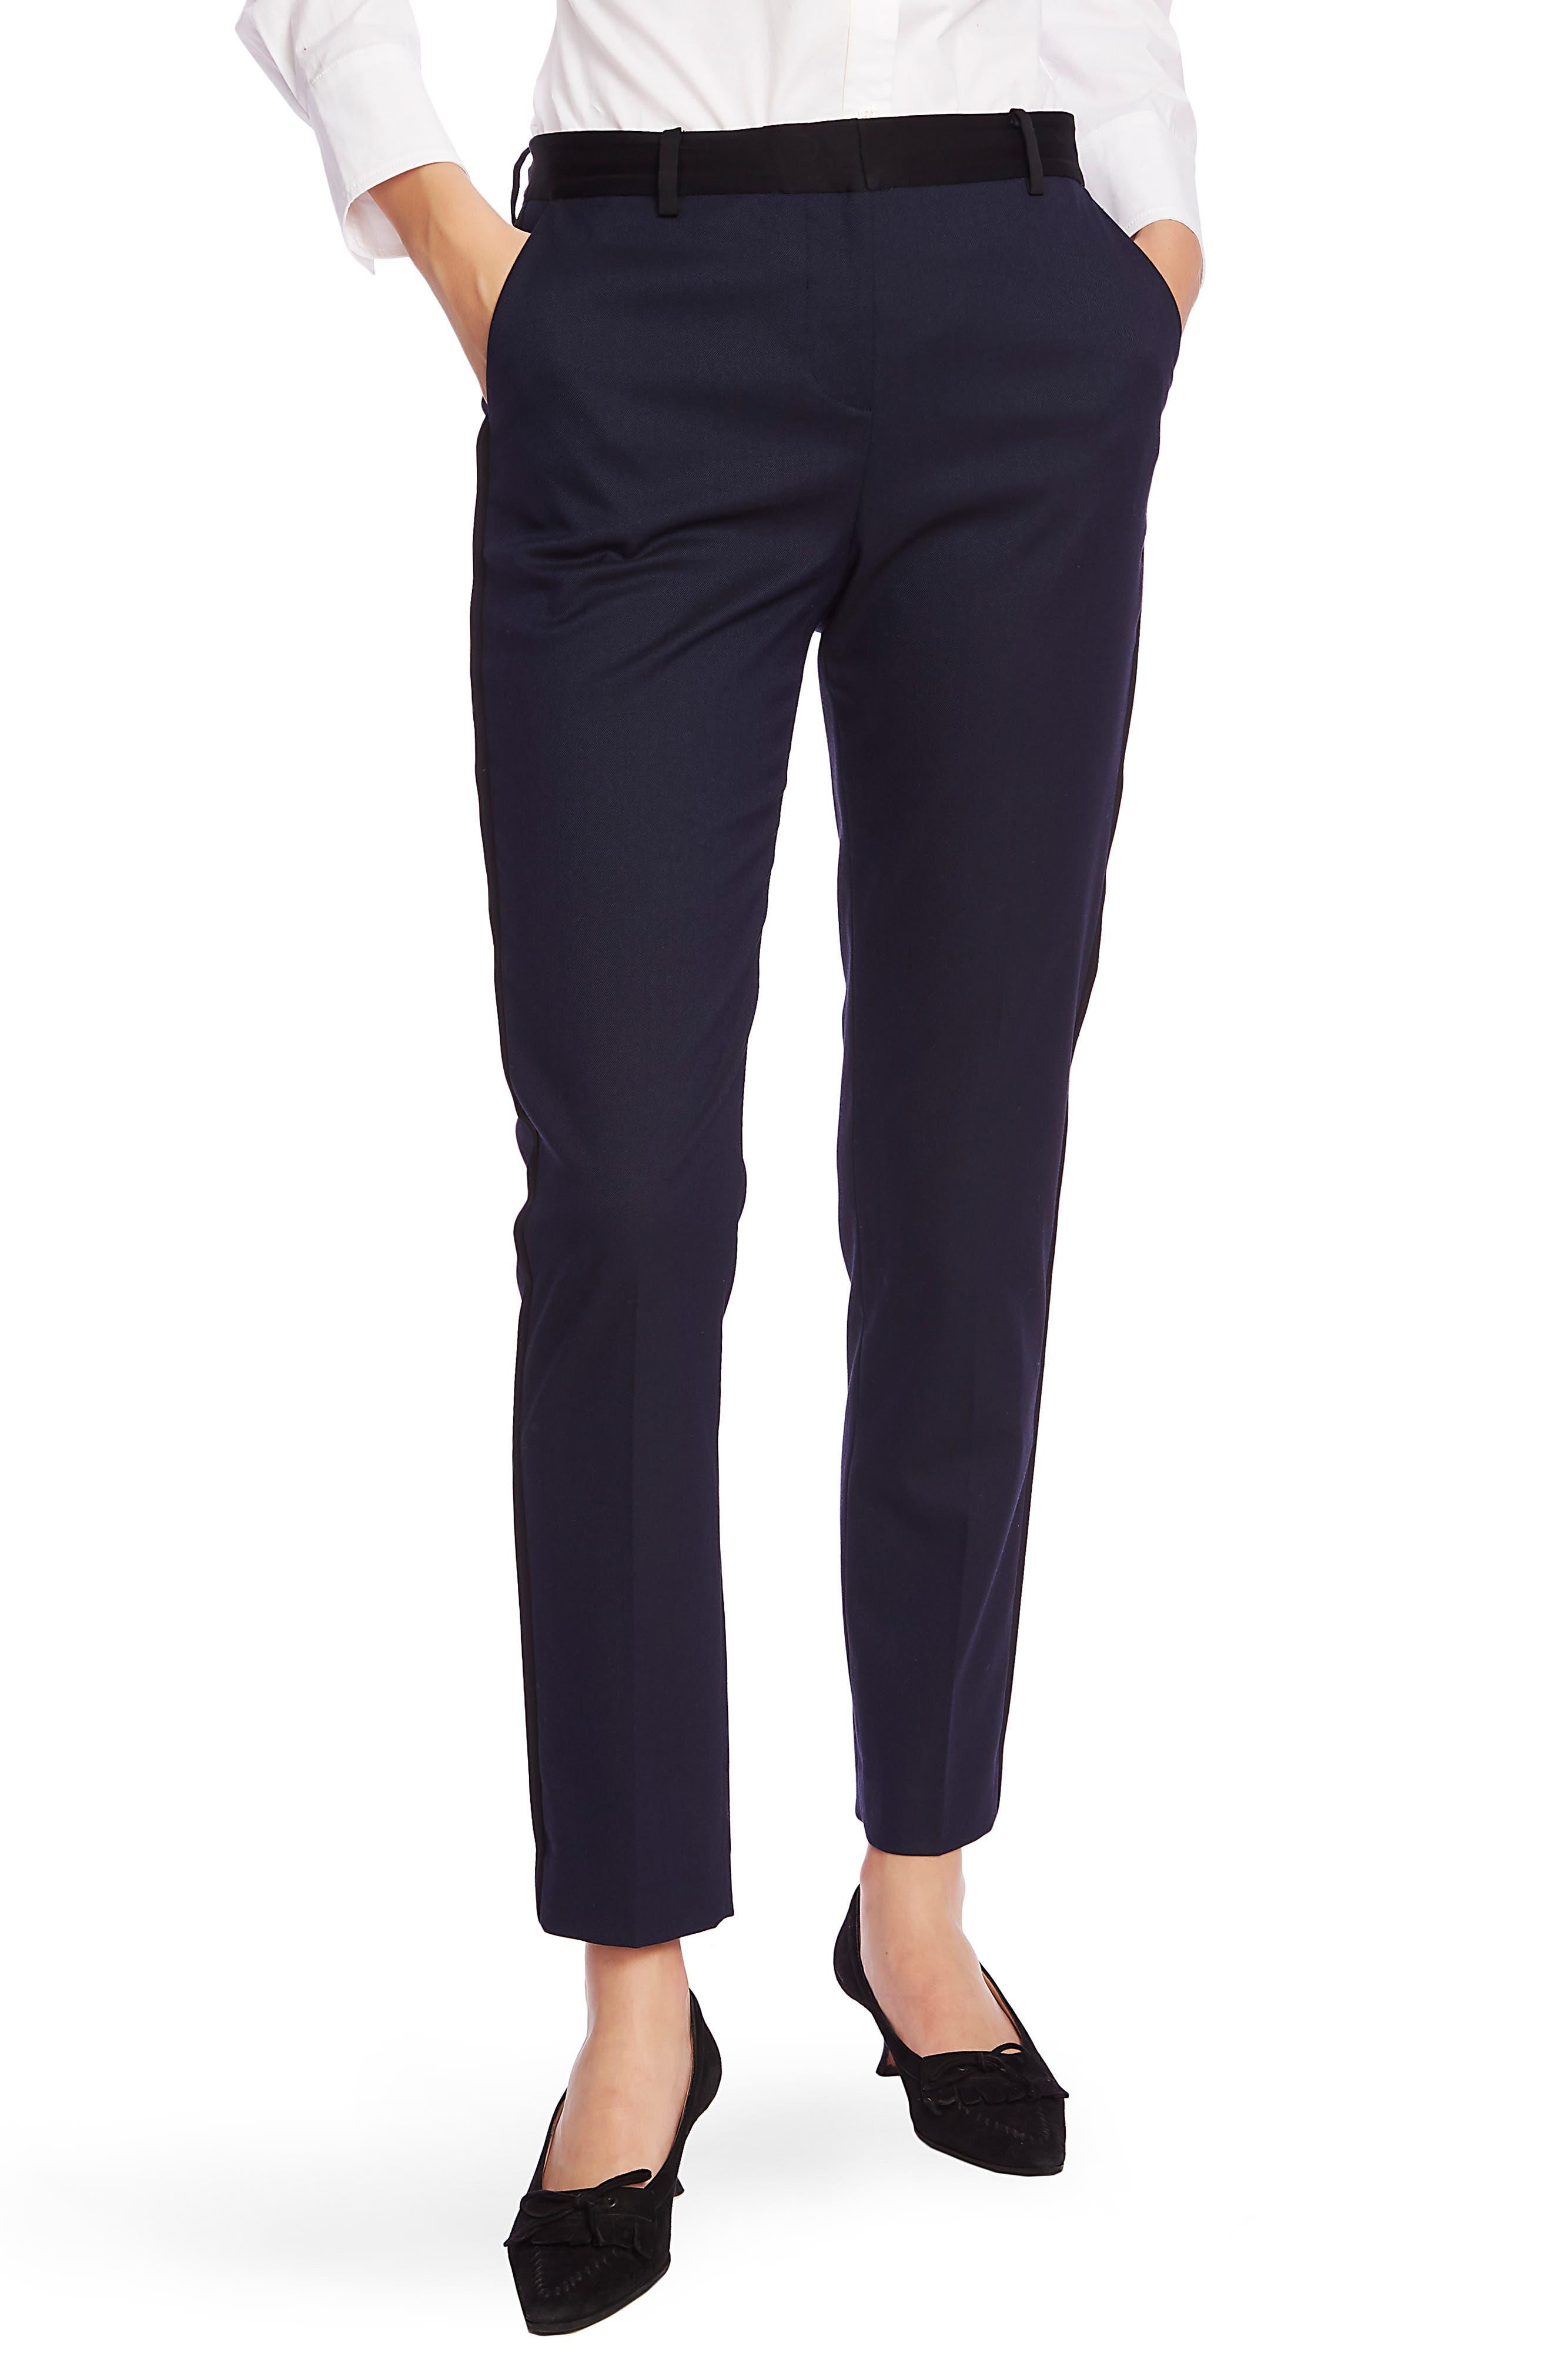 Court & Rowe Satin Tuxedo Stripe Pants